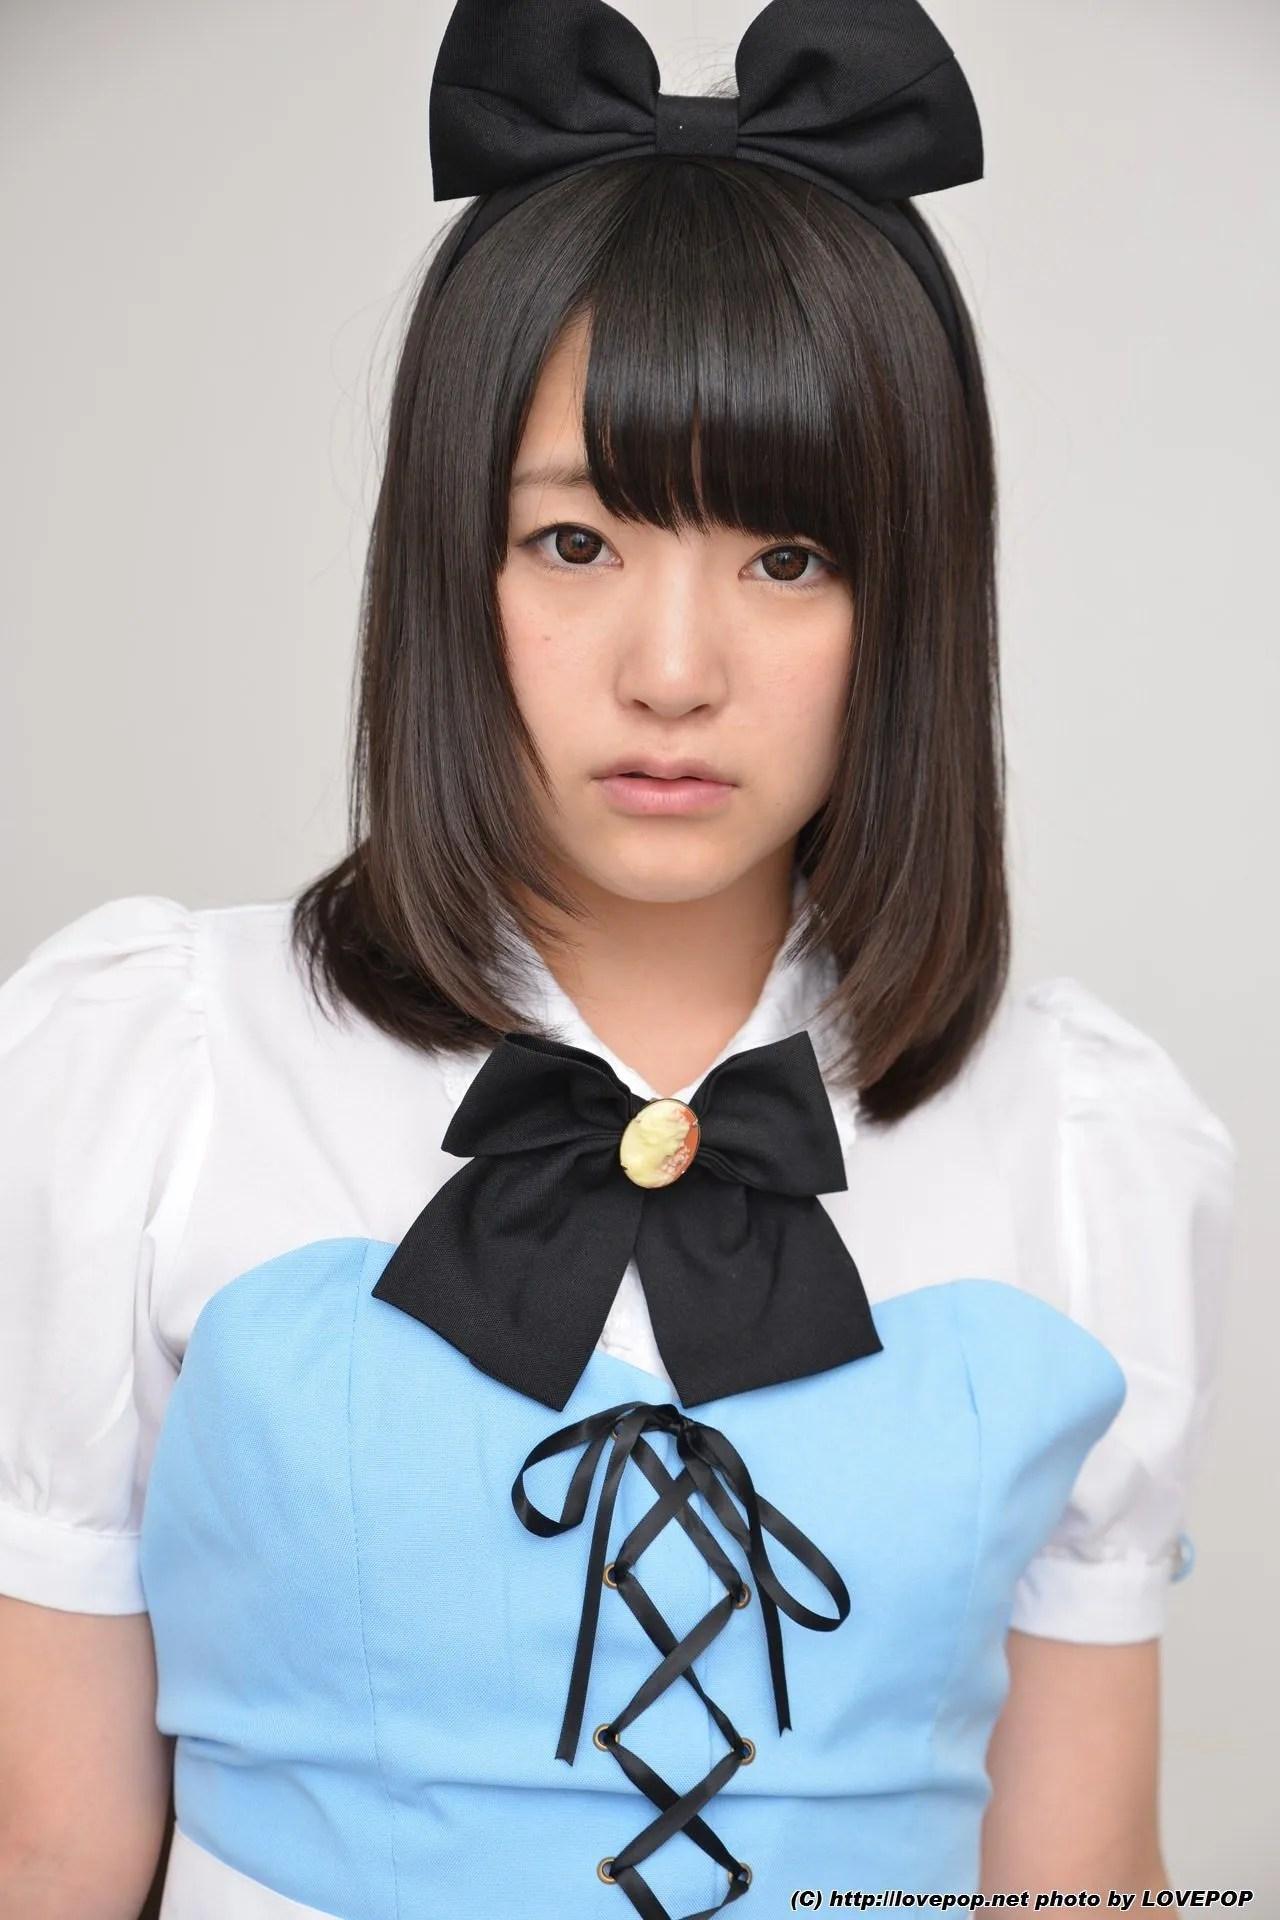 [LovePop] Tsuna Kimura 木村つな Maid Set03 写真集[65P]插图(3)